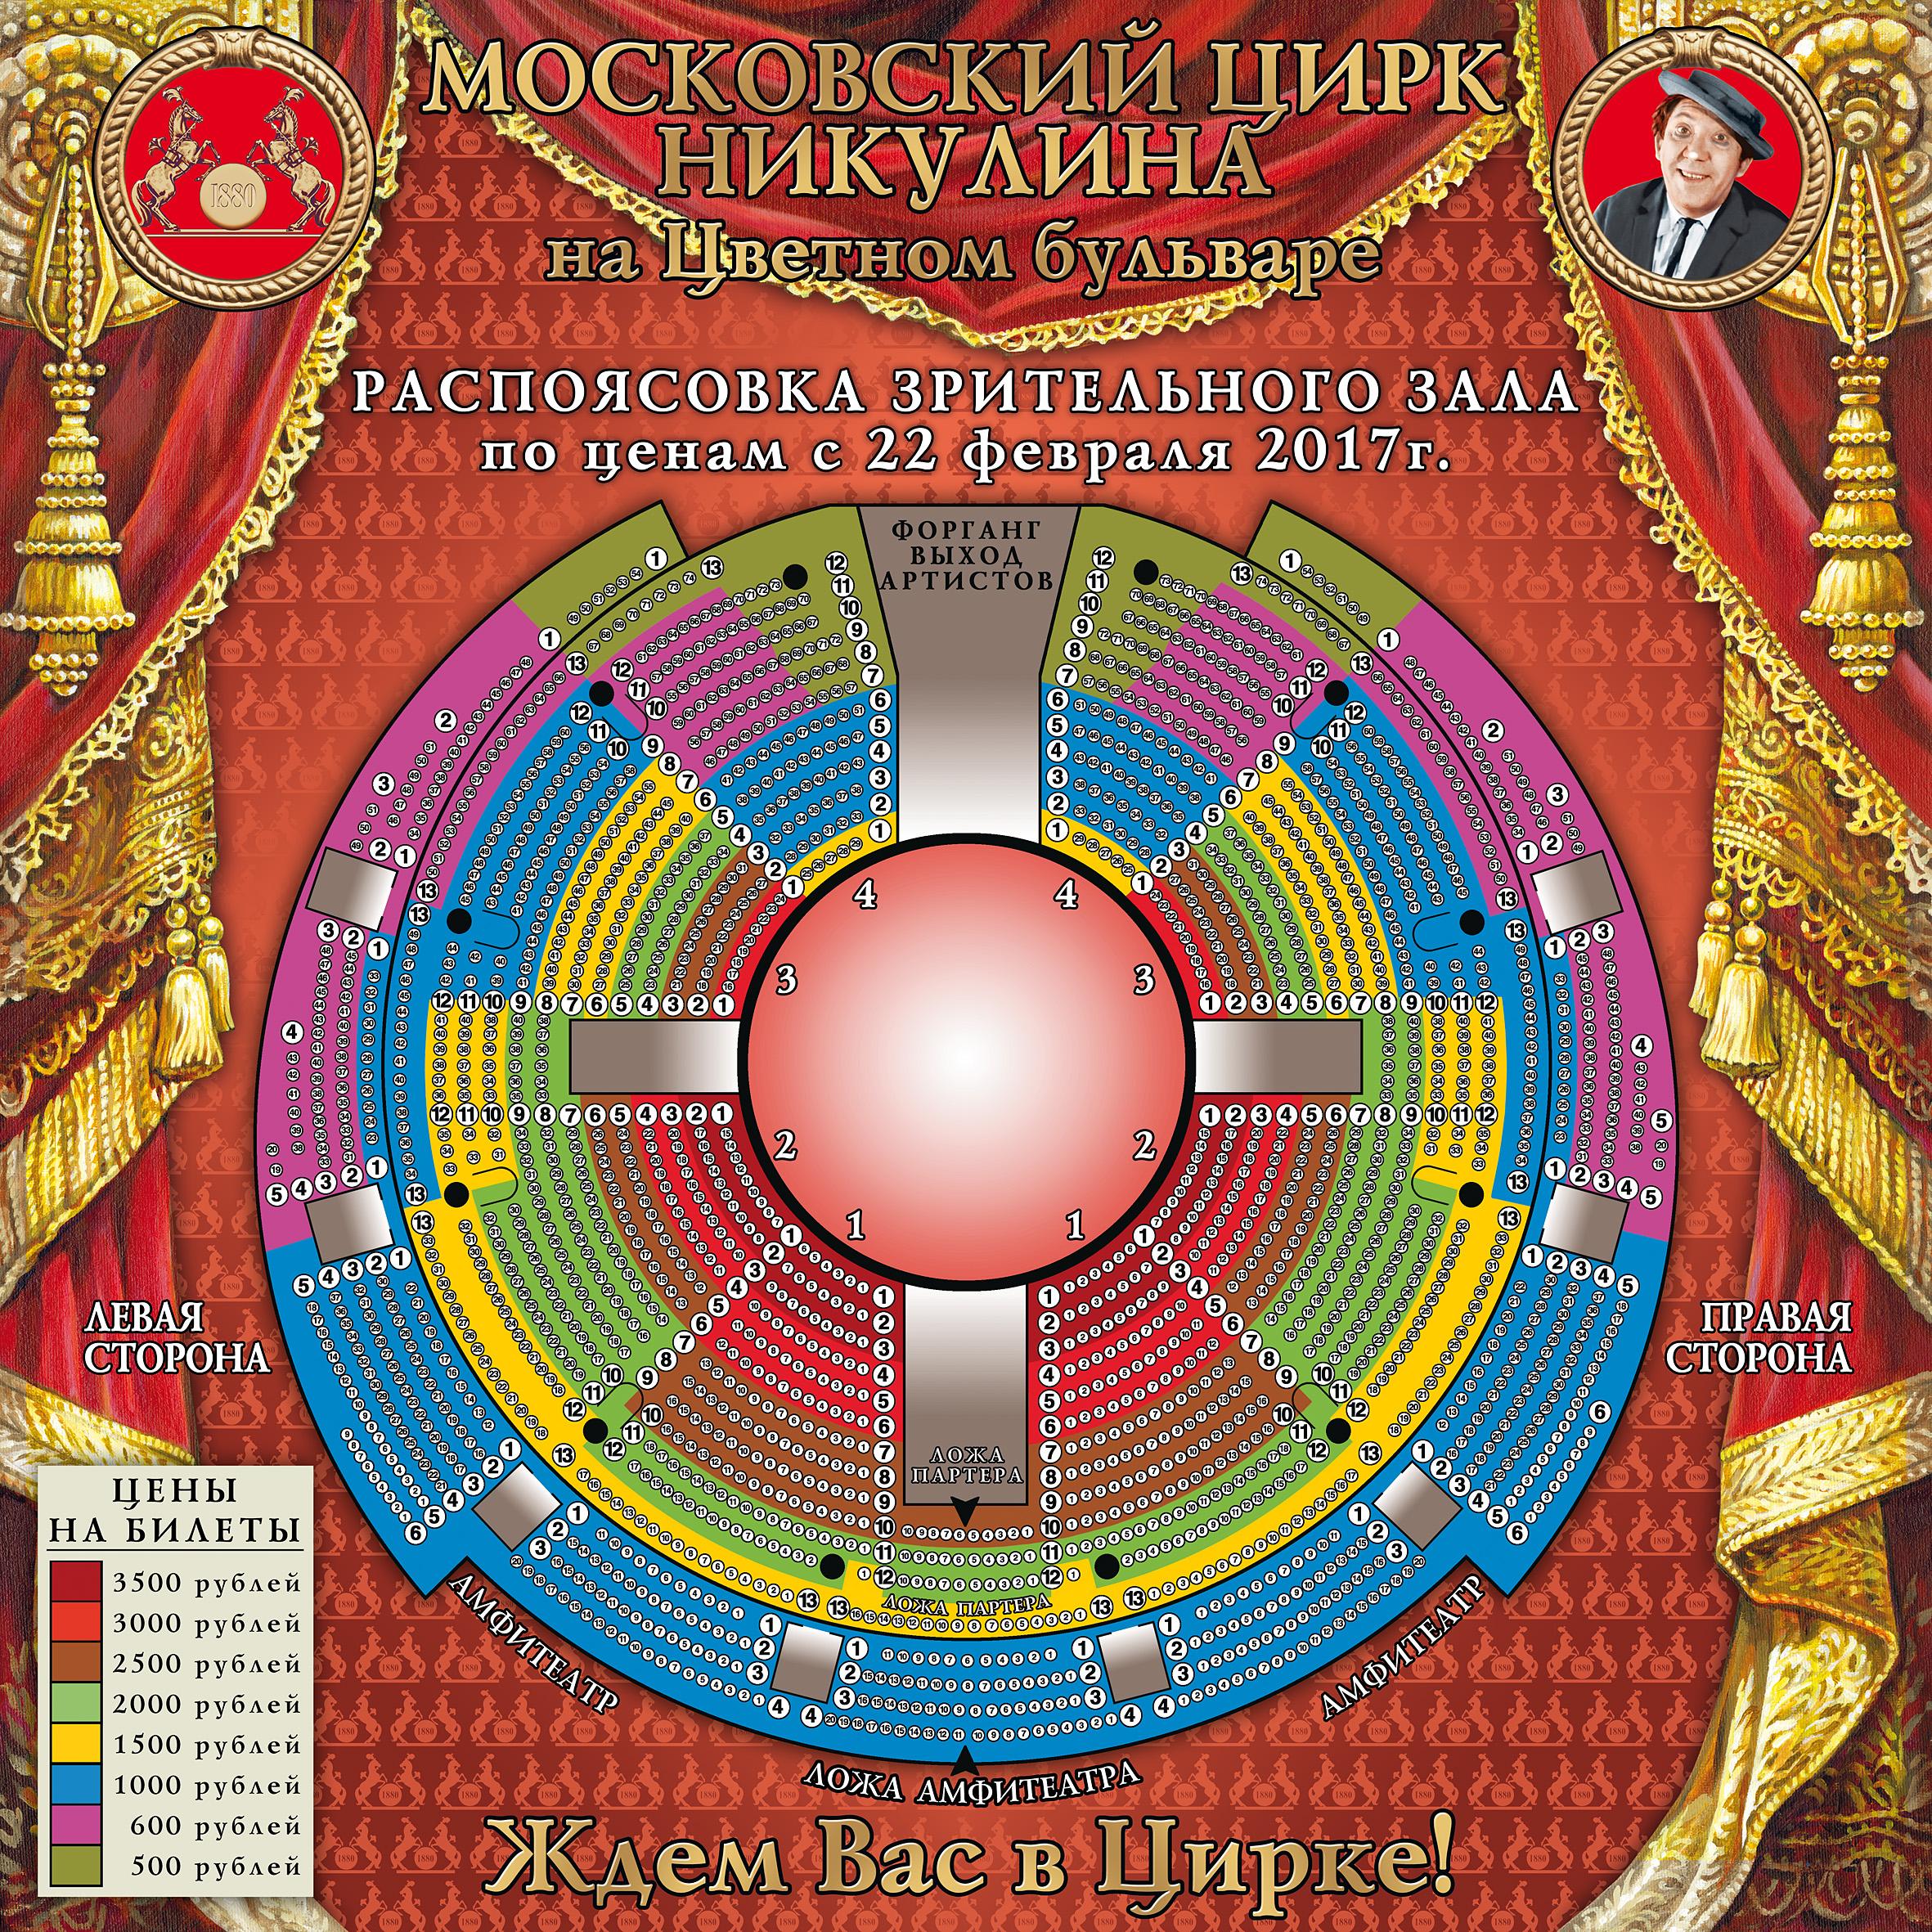 Цирк тюмень схема зала